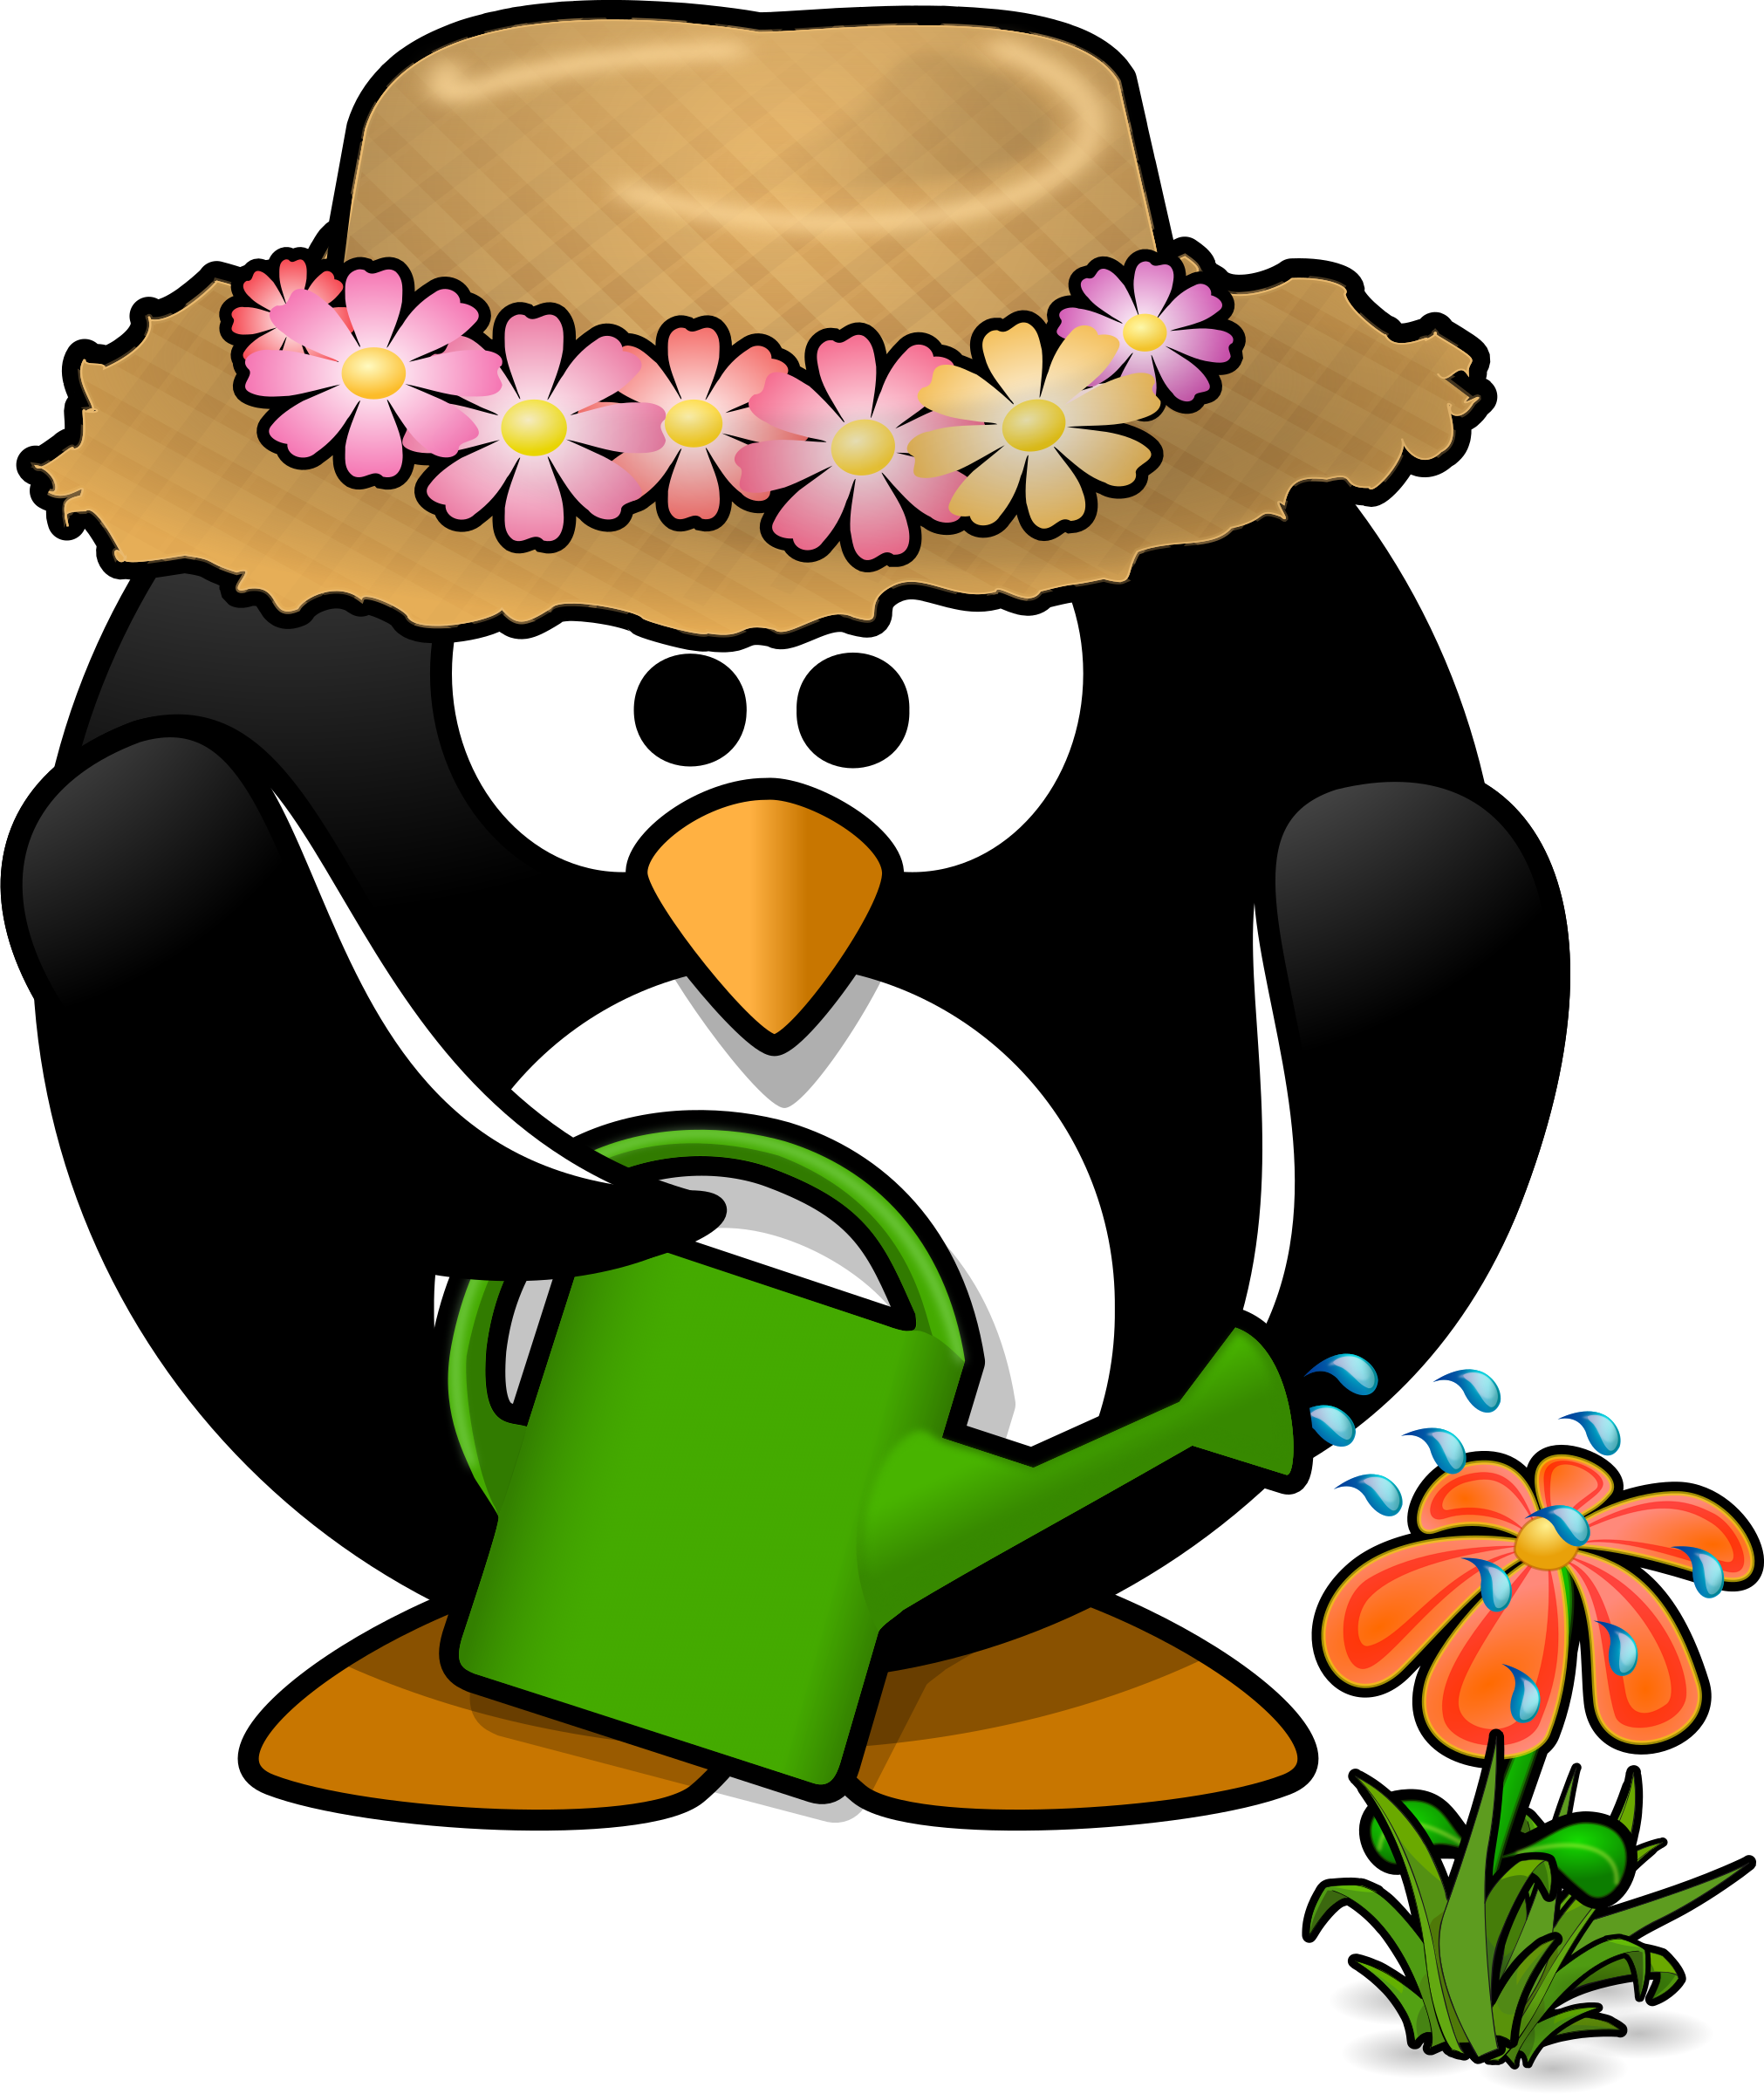 Pumpkin penguin clipart clip art black and white stock Microsoft clip art gardening clipart garden penguin toublanc info ... clip art black and white stock